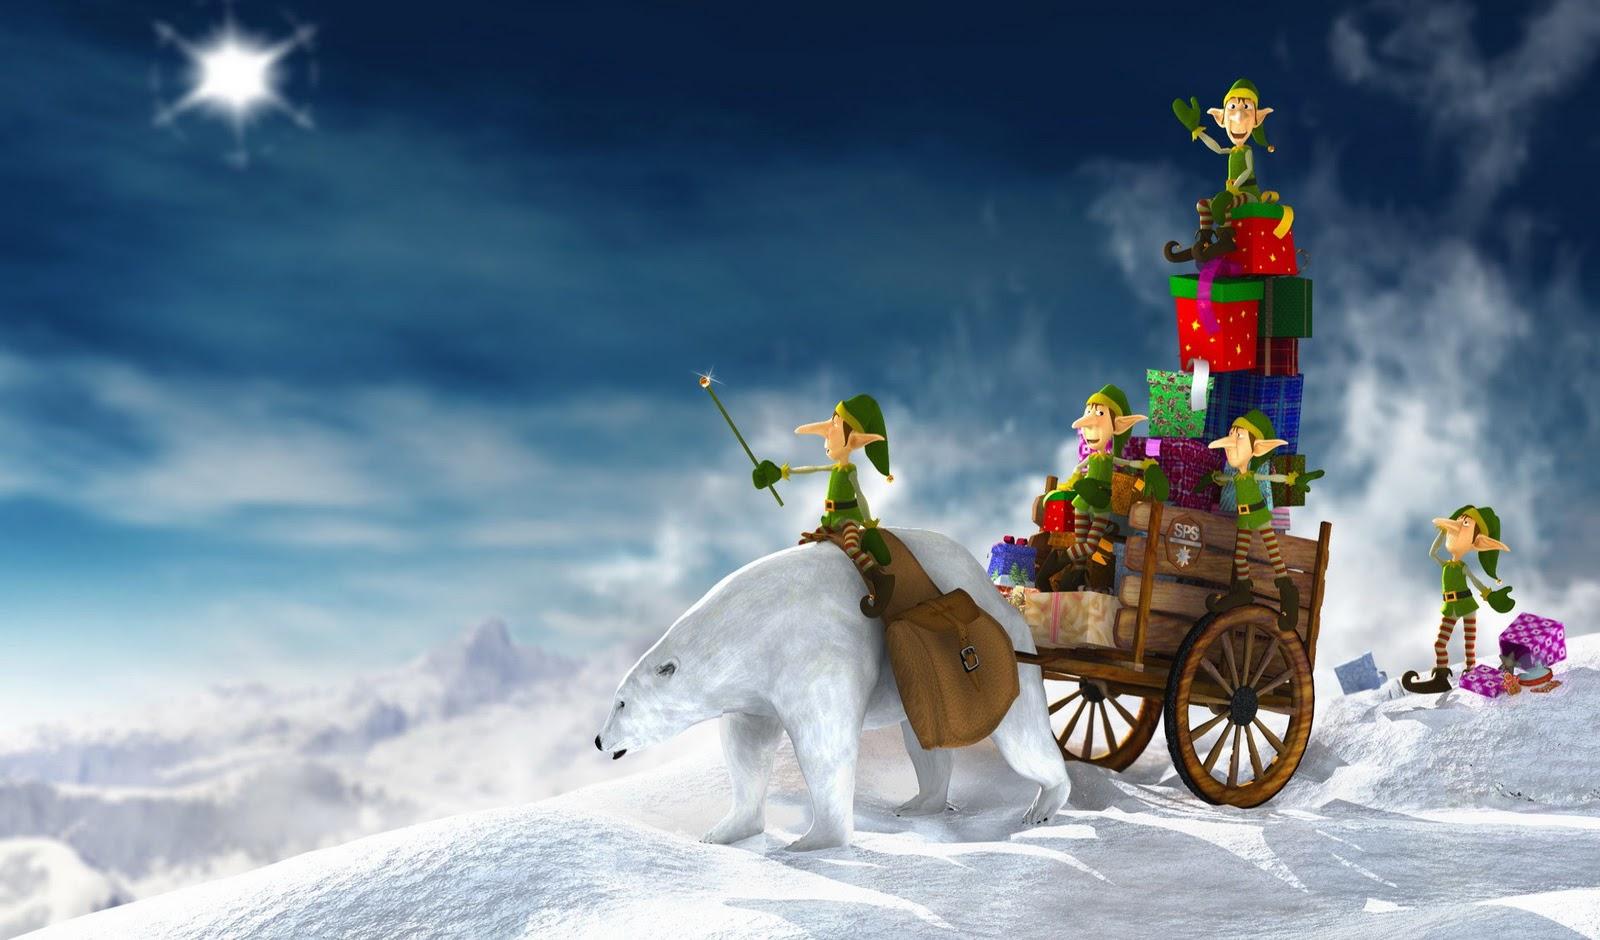 http://3.bp.blogspot.com/_Kpi0thIqeJI/TRHe0b328PI/AAAAAAAAA0k/WKa9RLareiU/s1600/Christmas+HD+Wallpapers+1920x1200+%252813%2529.jpg